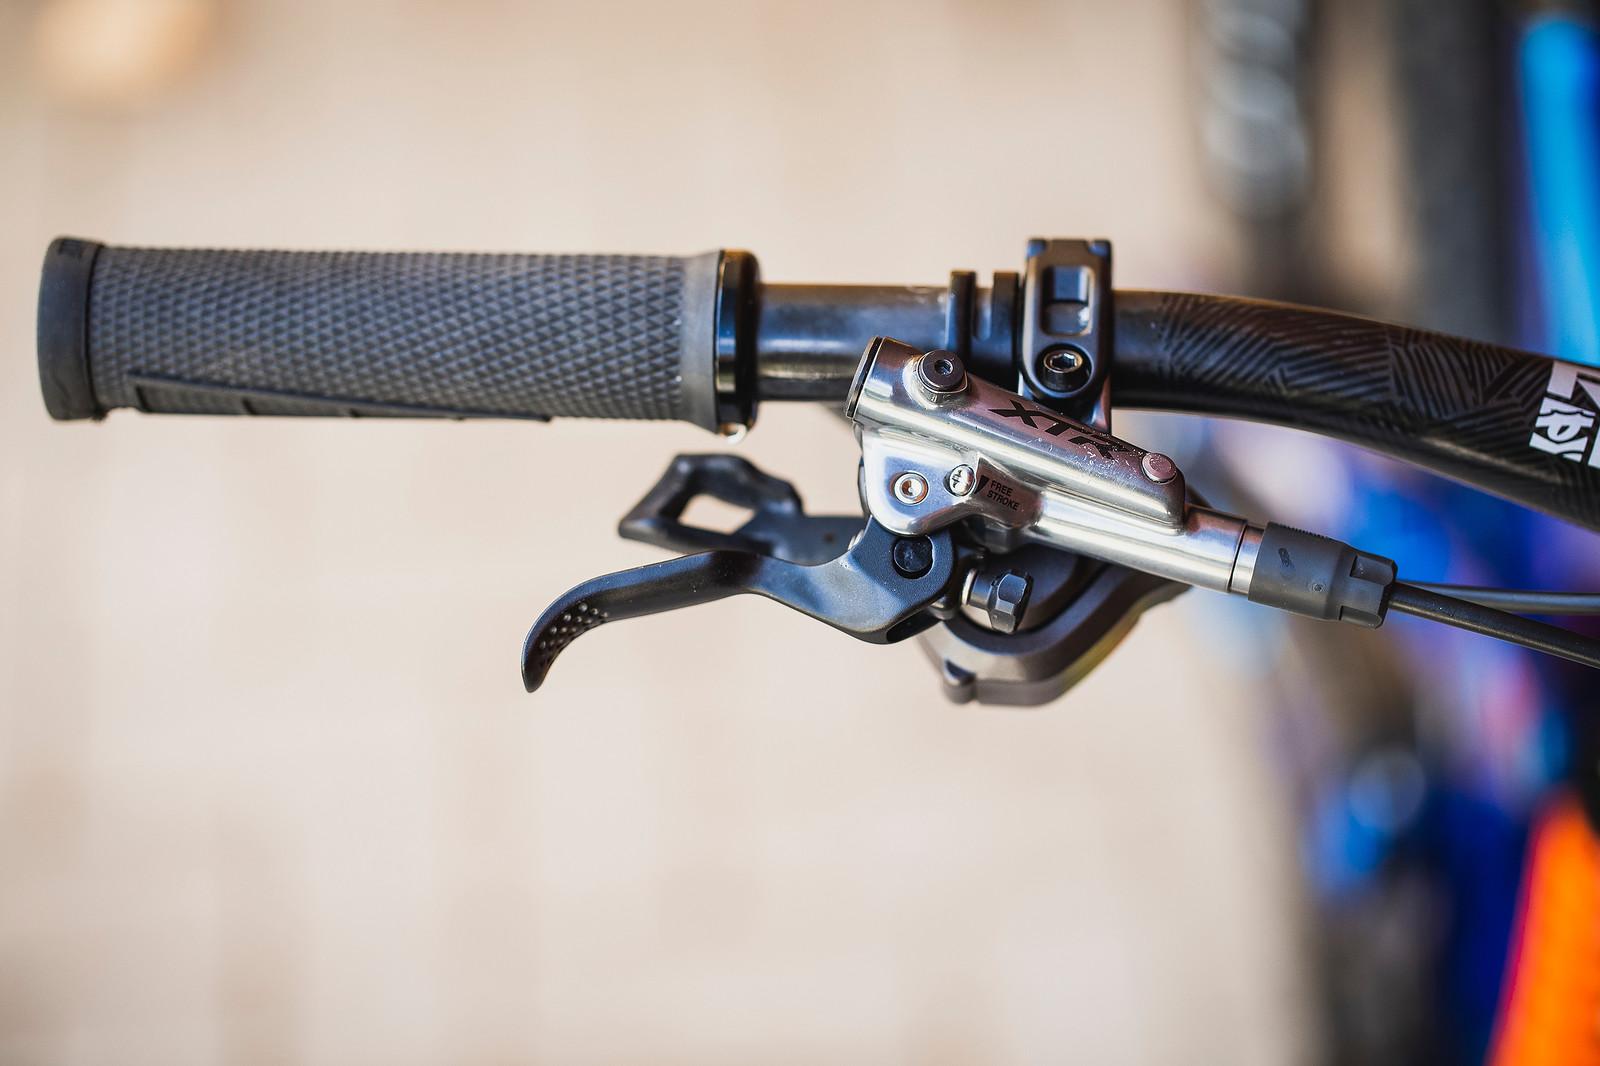 Shimano XTR Brake Levers - Pro Bike Check - George Brannigan's GT Fury - Mountain Biking Pictures - Vital MTB